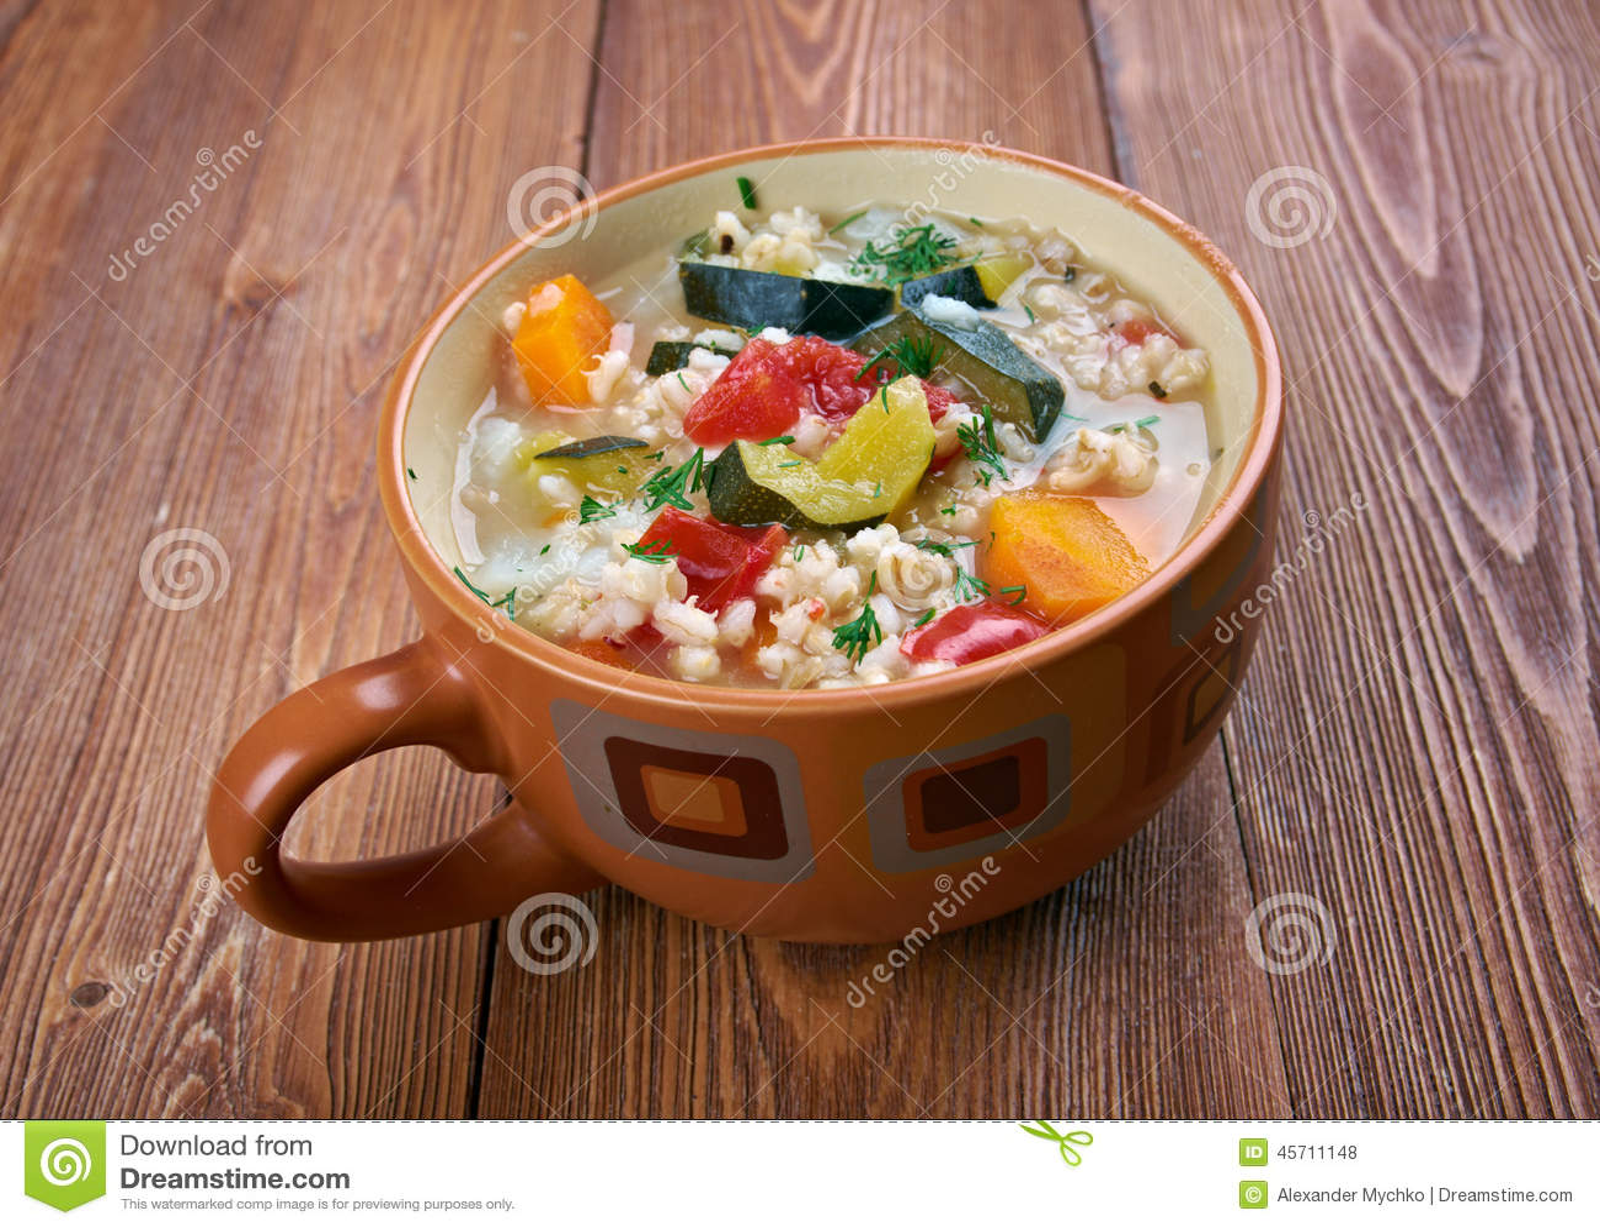 zuppa d€orzo -与菜的大麦汤,传统意大利盘.